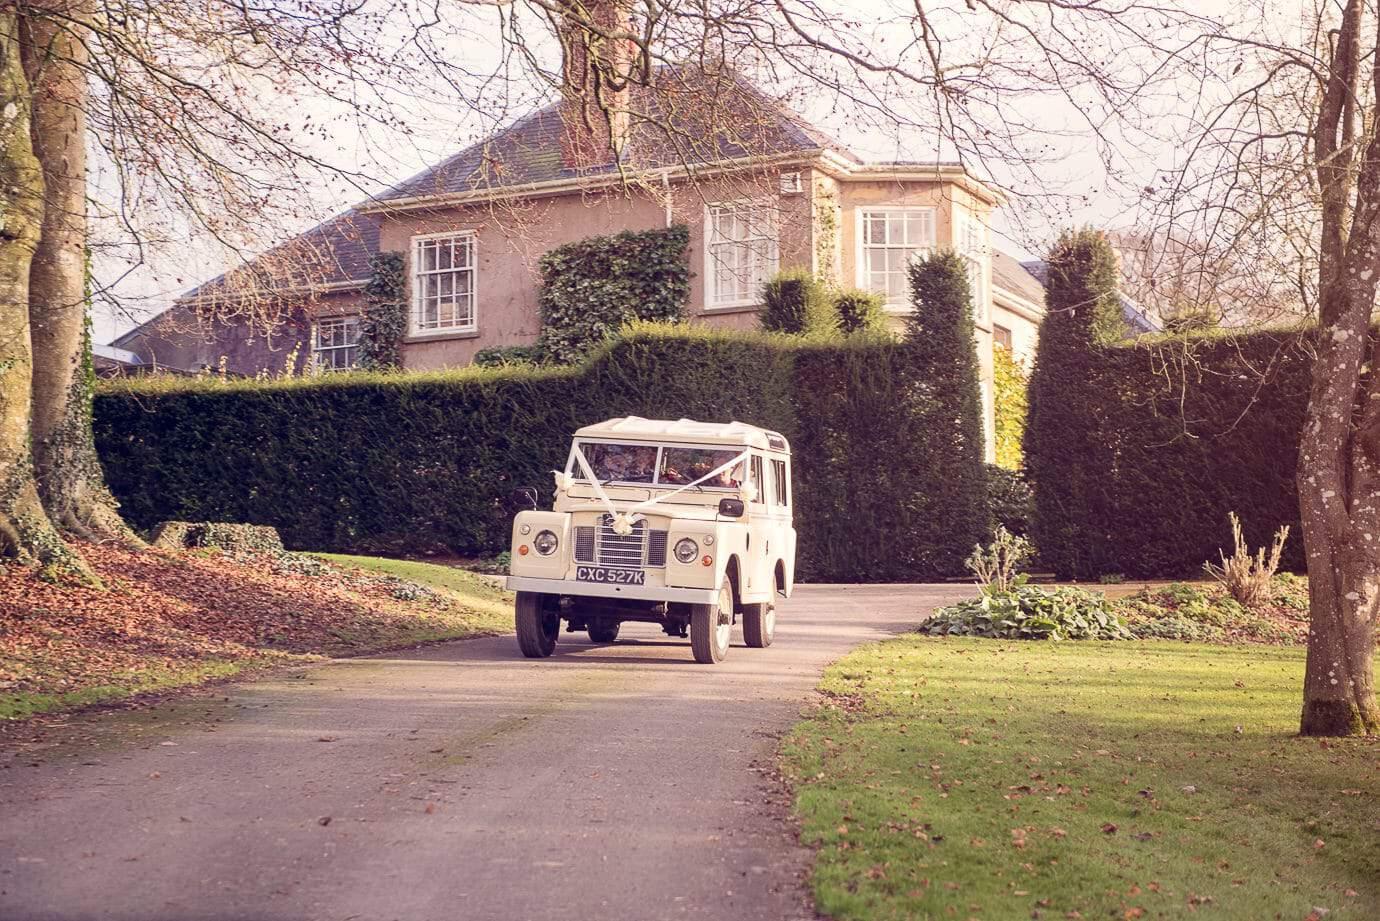 Classic Land Rover wedding car leaves Plush Manor wedding venue in Dorset